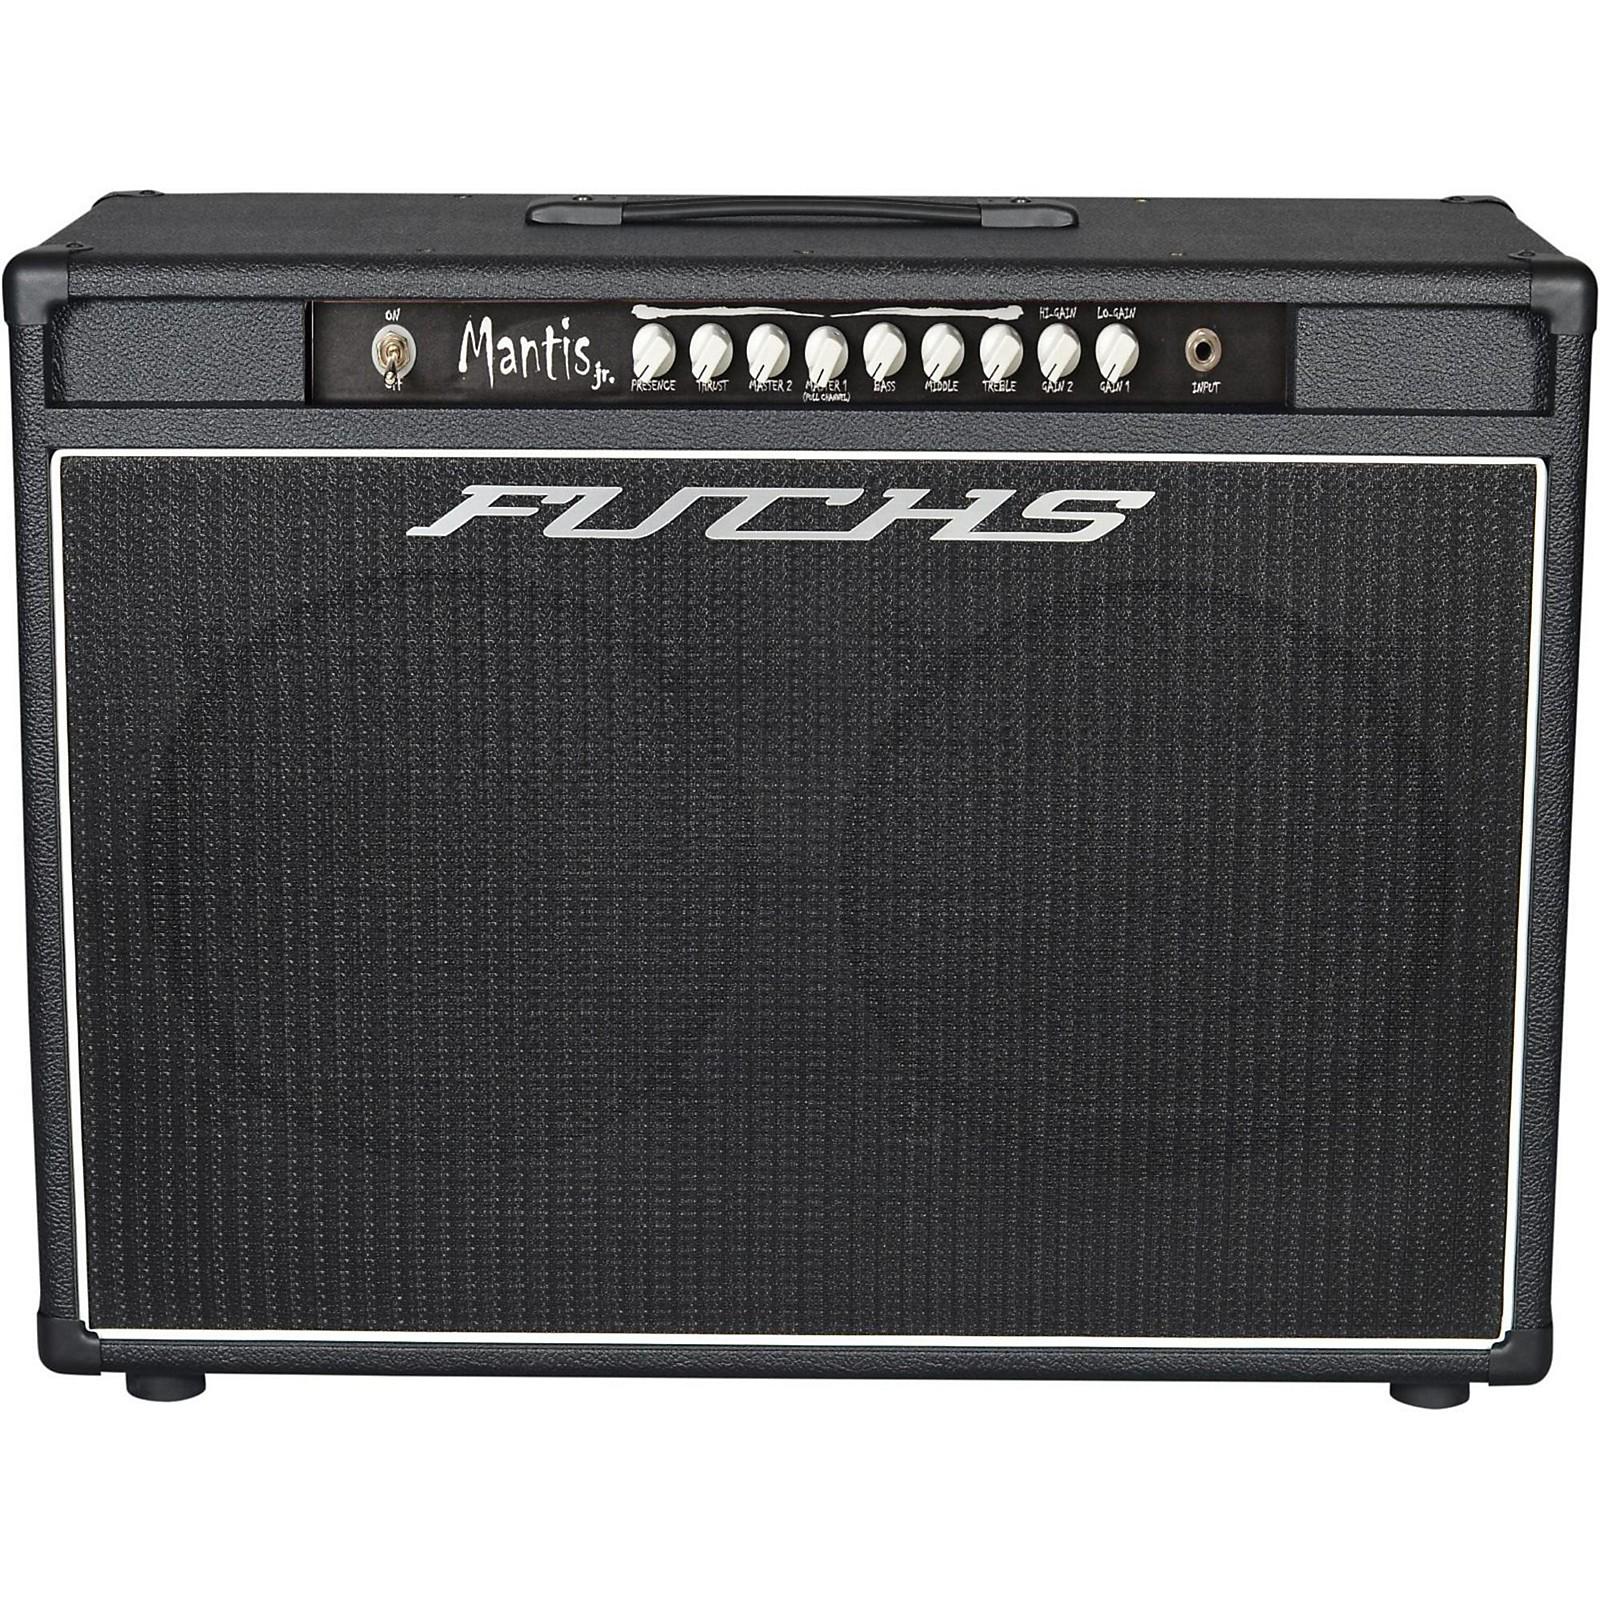 Fuchs Mantis Jr. 2x12 50W Tube Guitar Combo Amp